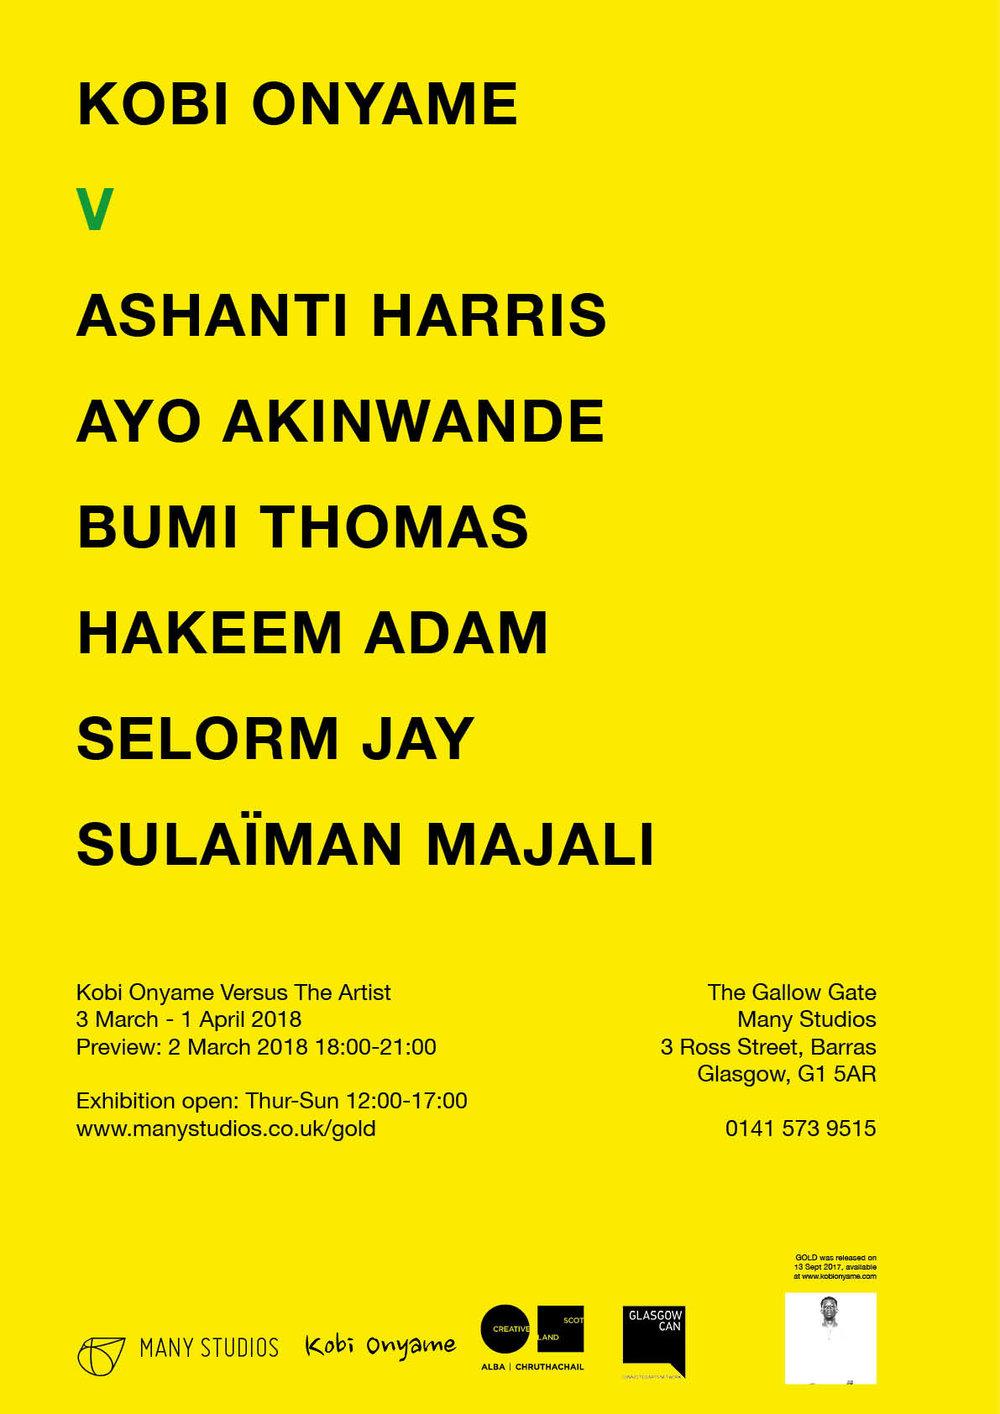 KobiOnyameVersus-poster-yellow2.jpg